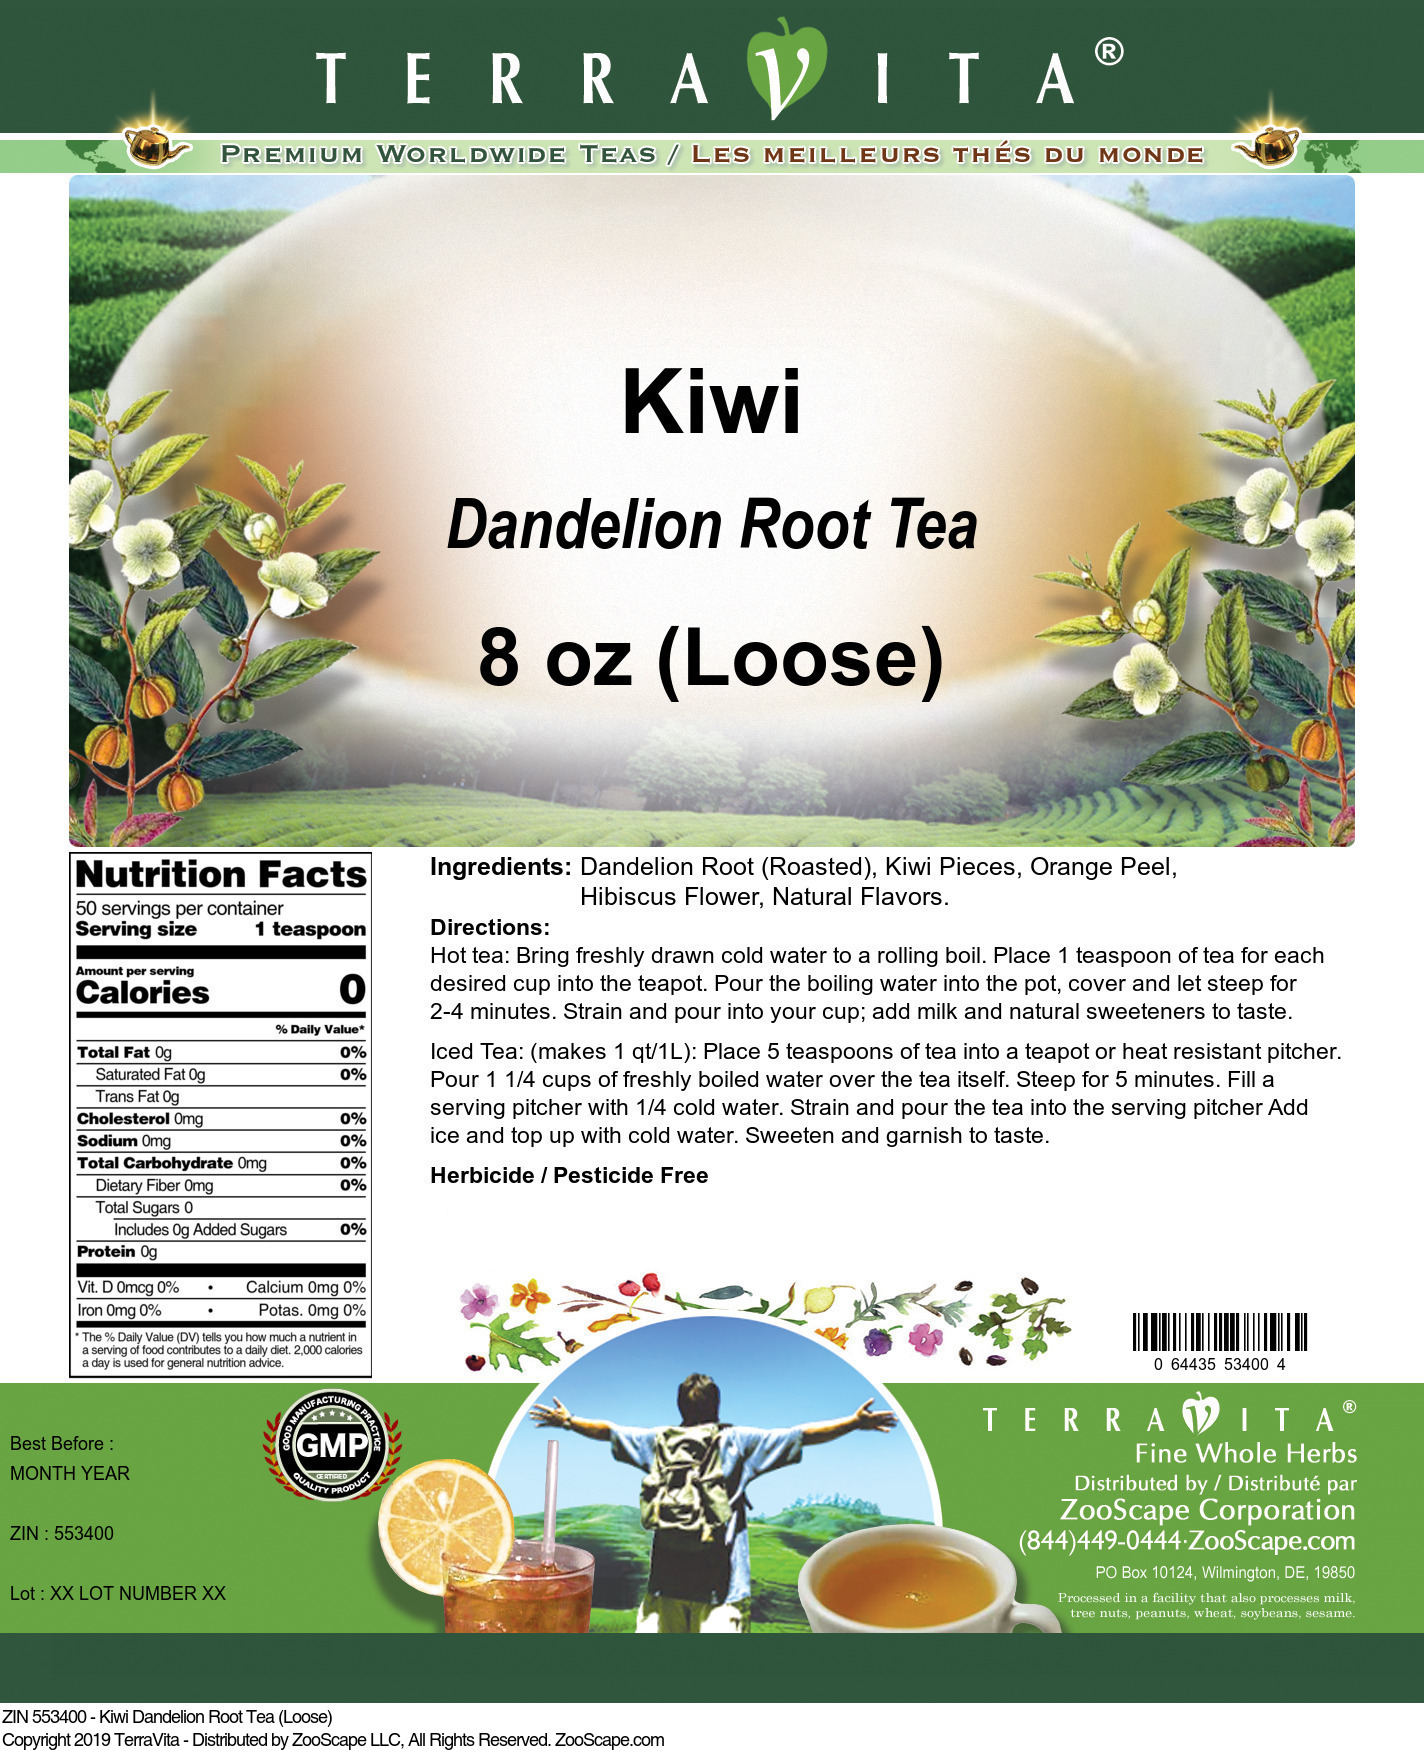 Kiwi Dandelion Root Tea (Loose)